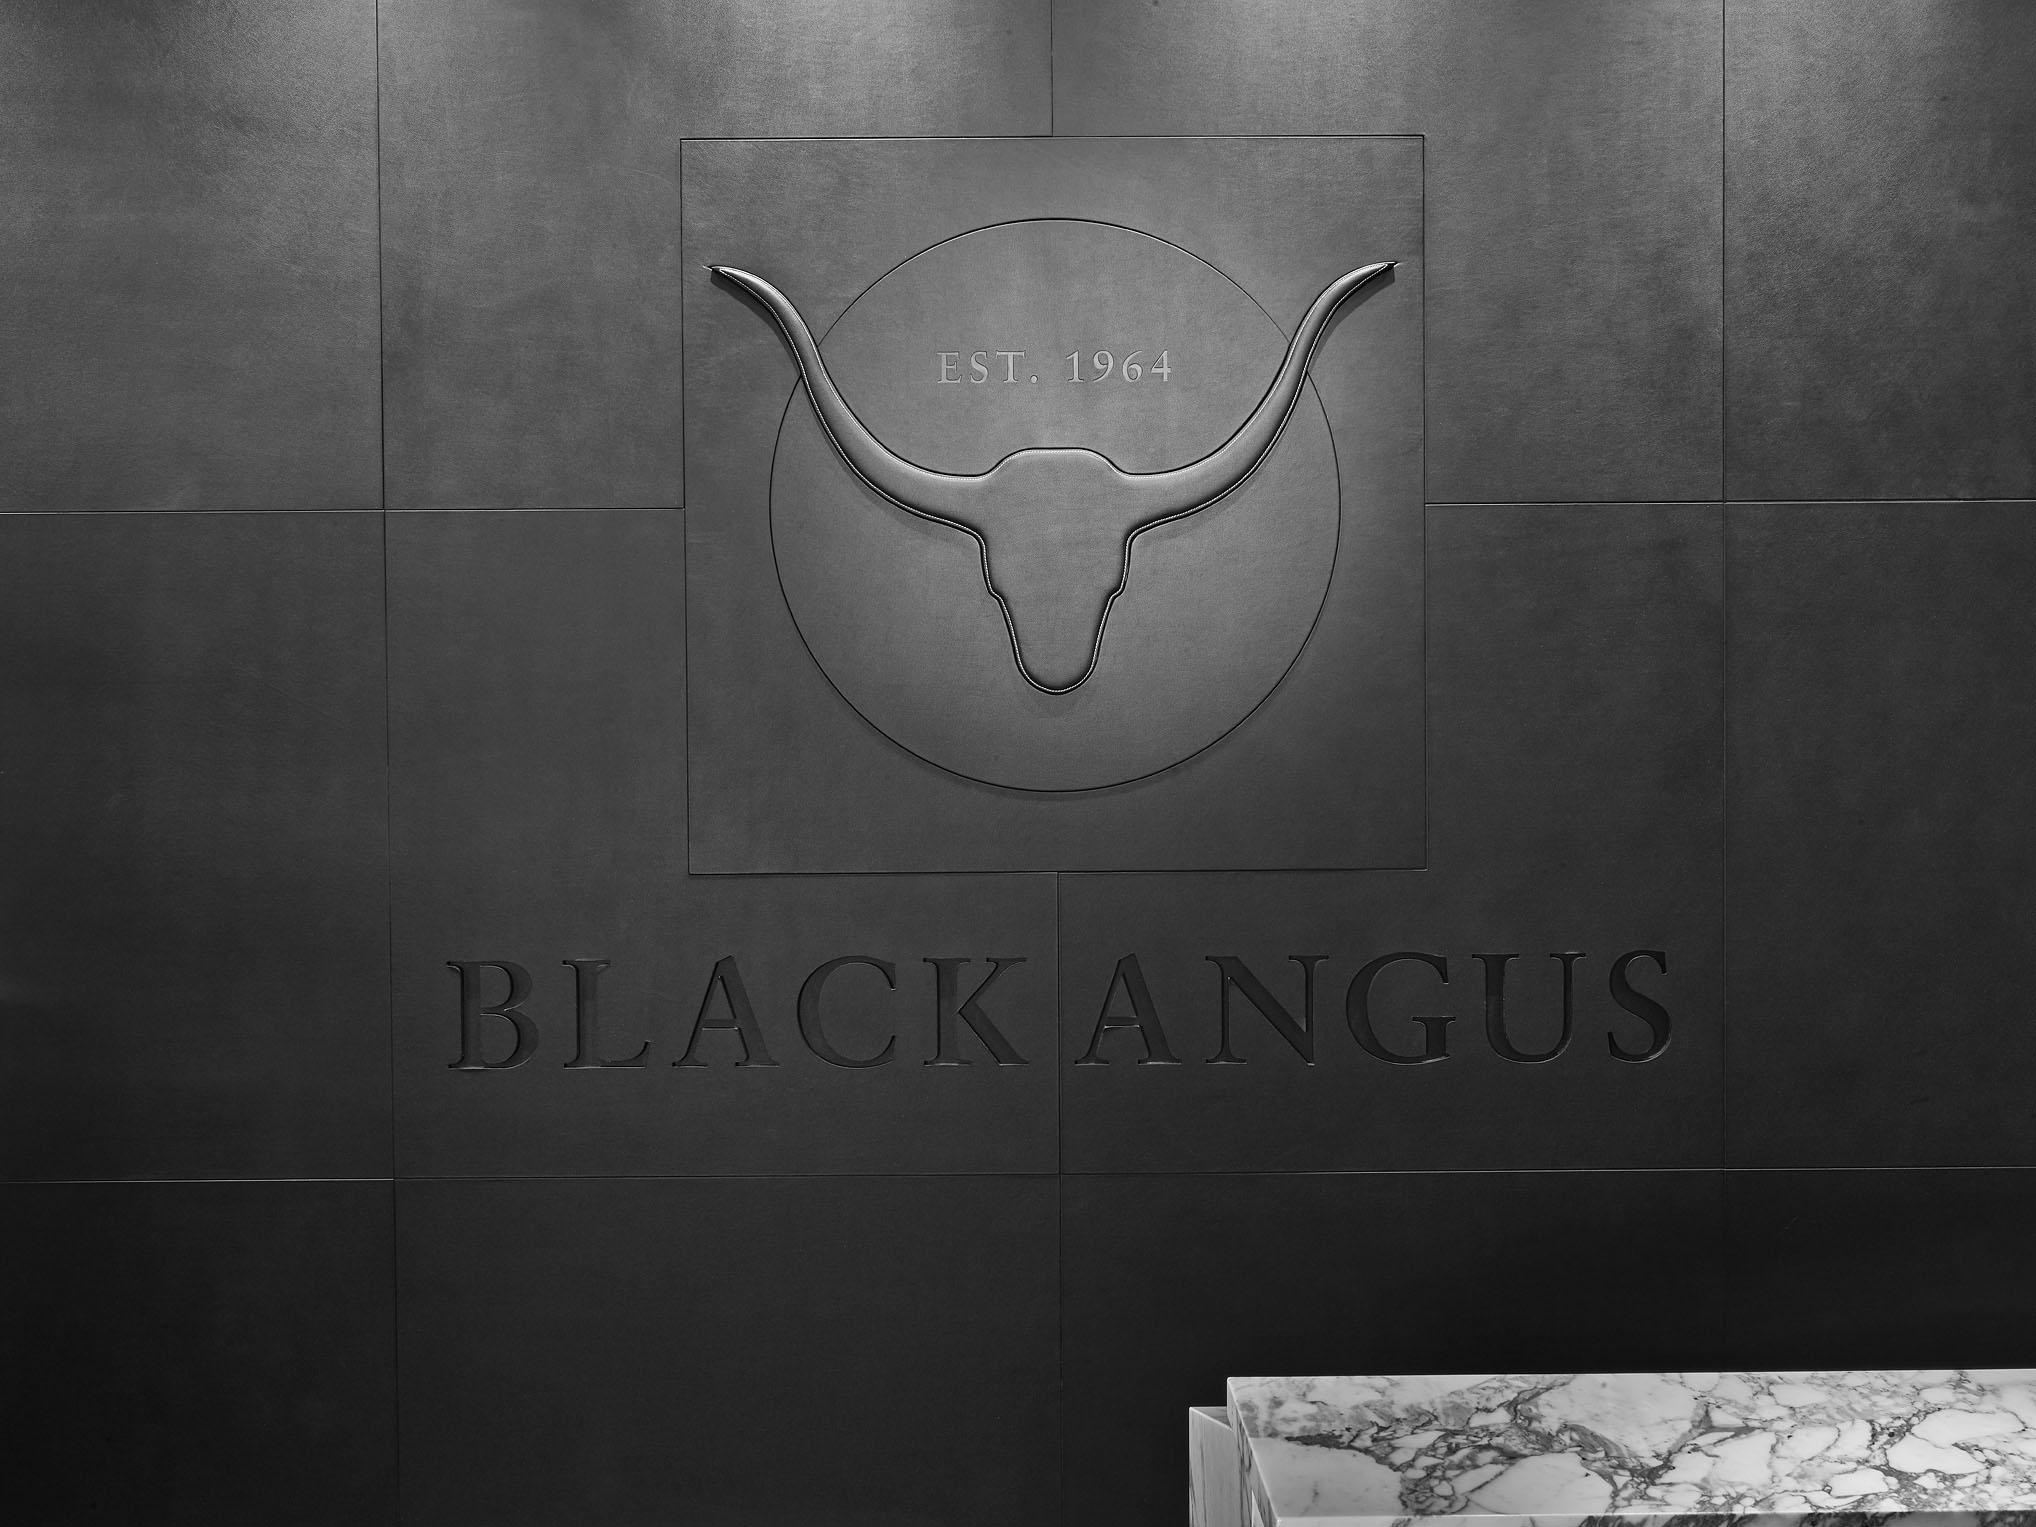 cmpg_06-18_BlackAngus-Divia14203-a copy.jpg